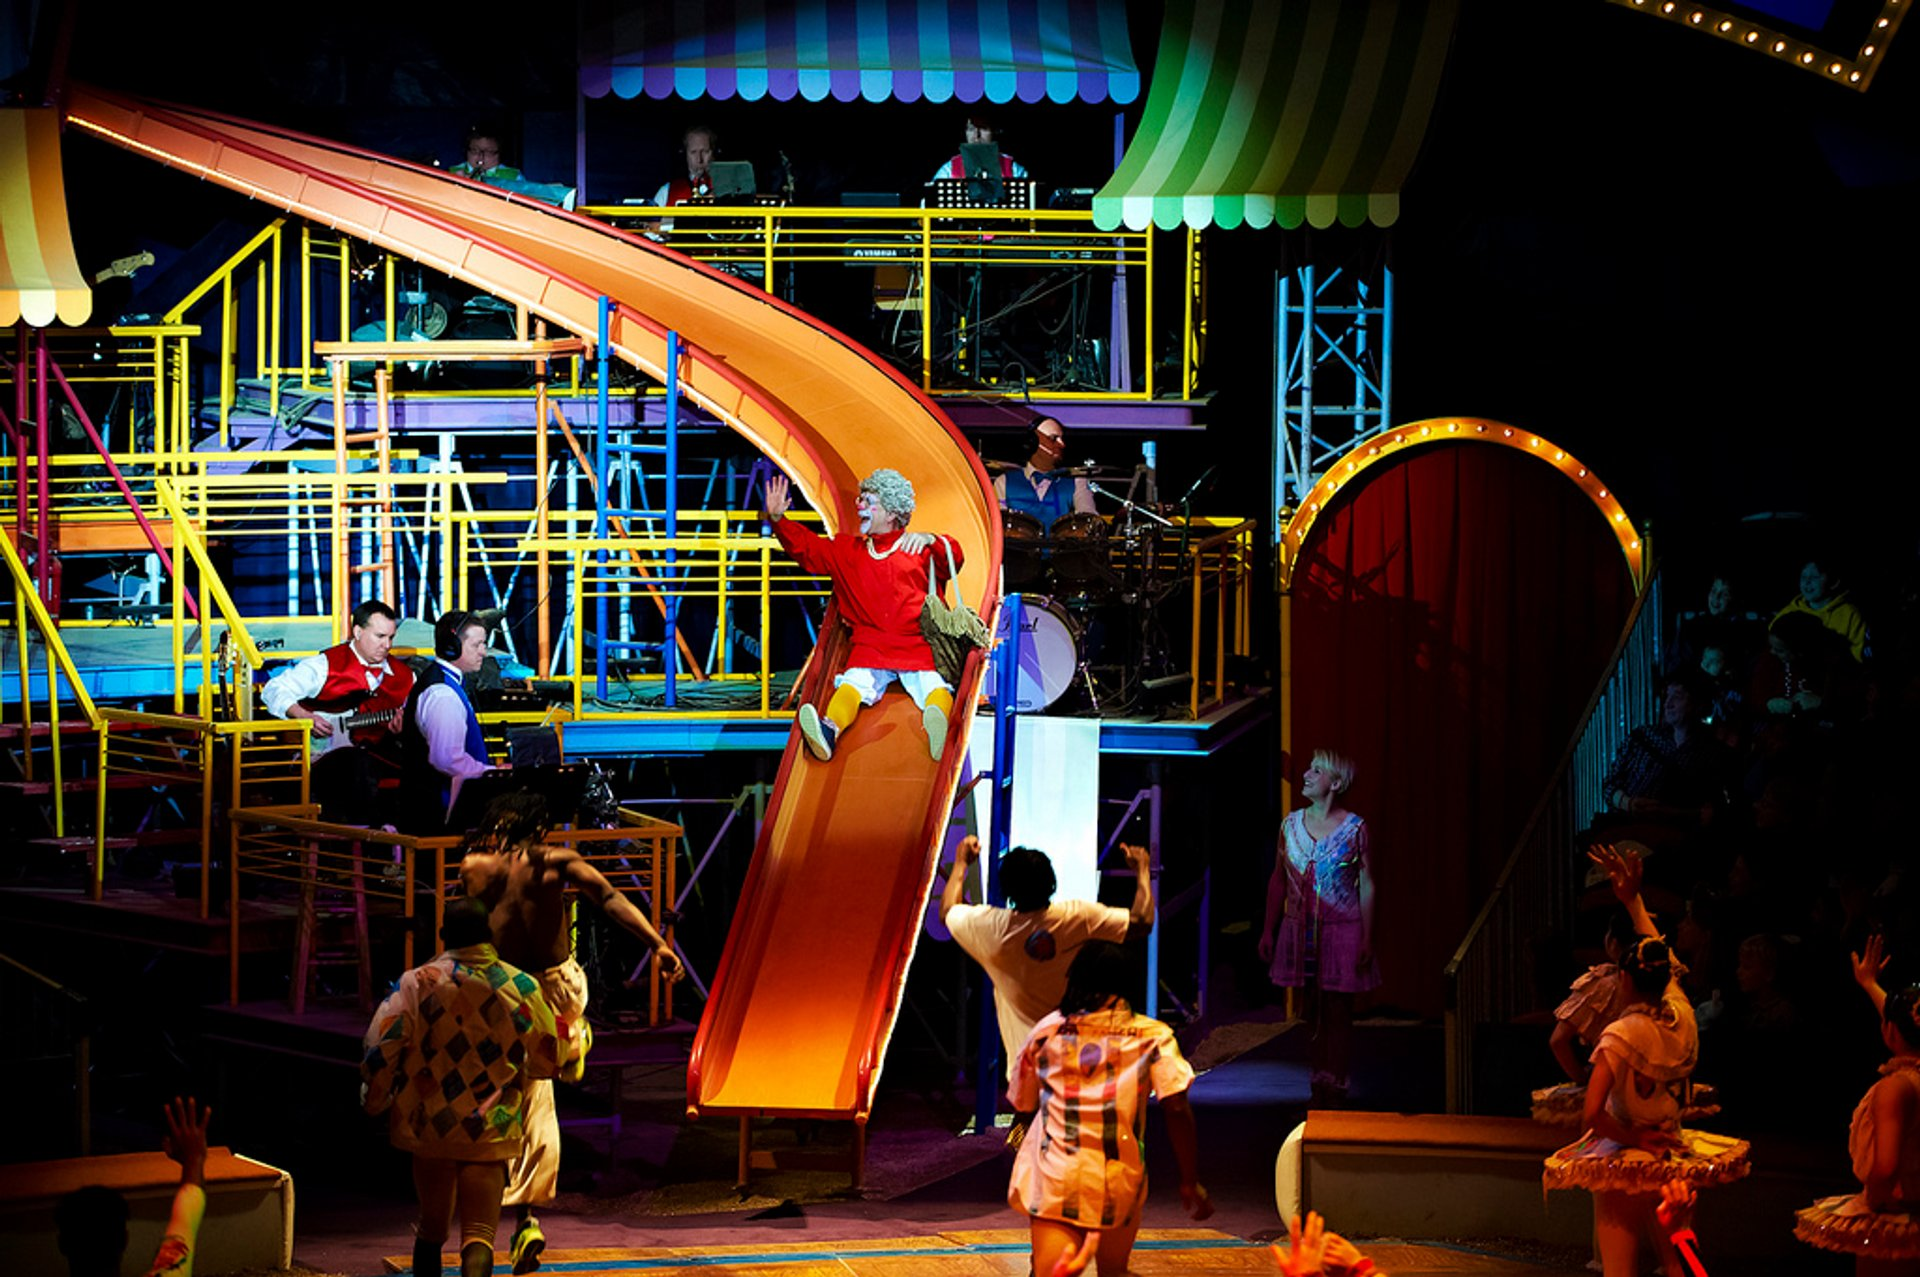 Big Apple Circus in New York - Best Season 2020